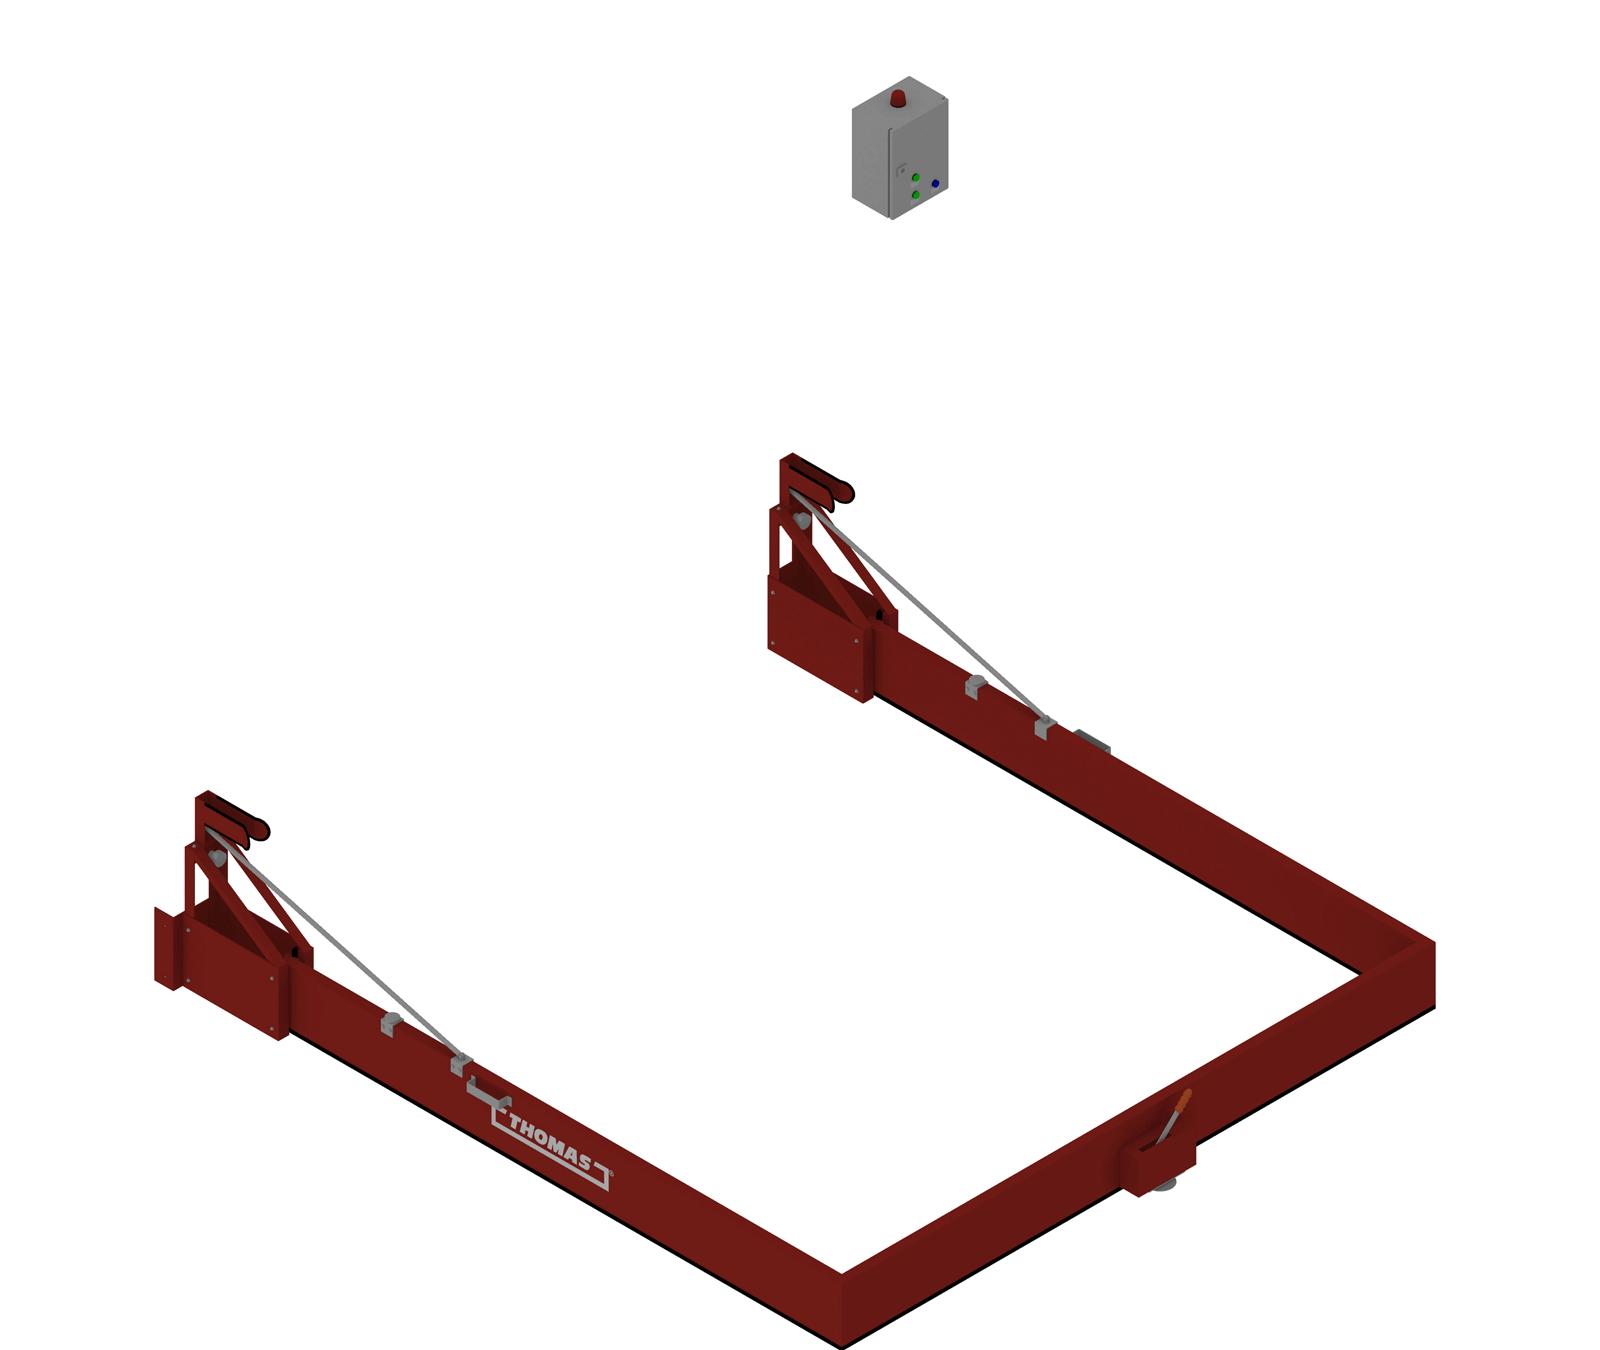 thomas-systech-automatische-barriere-laderampenabdichtung-manuelle-rueckstellung-geschlossen-1600×1350